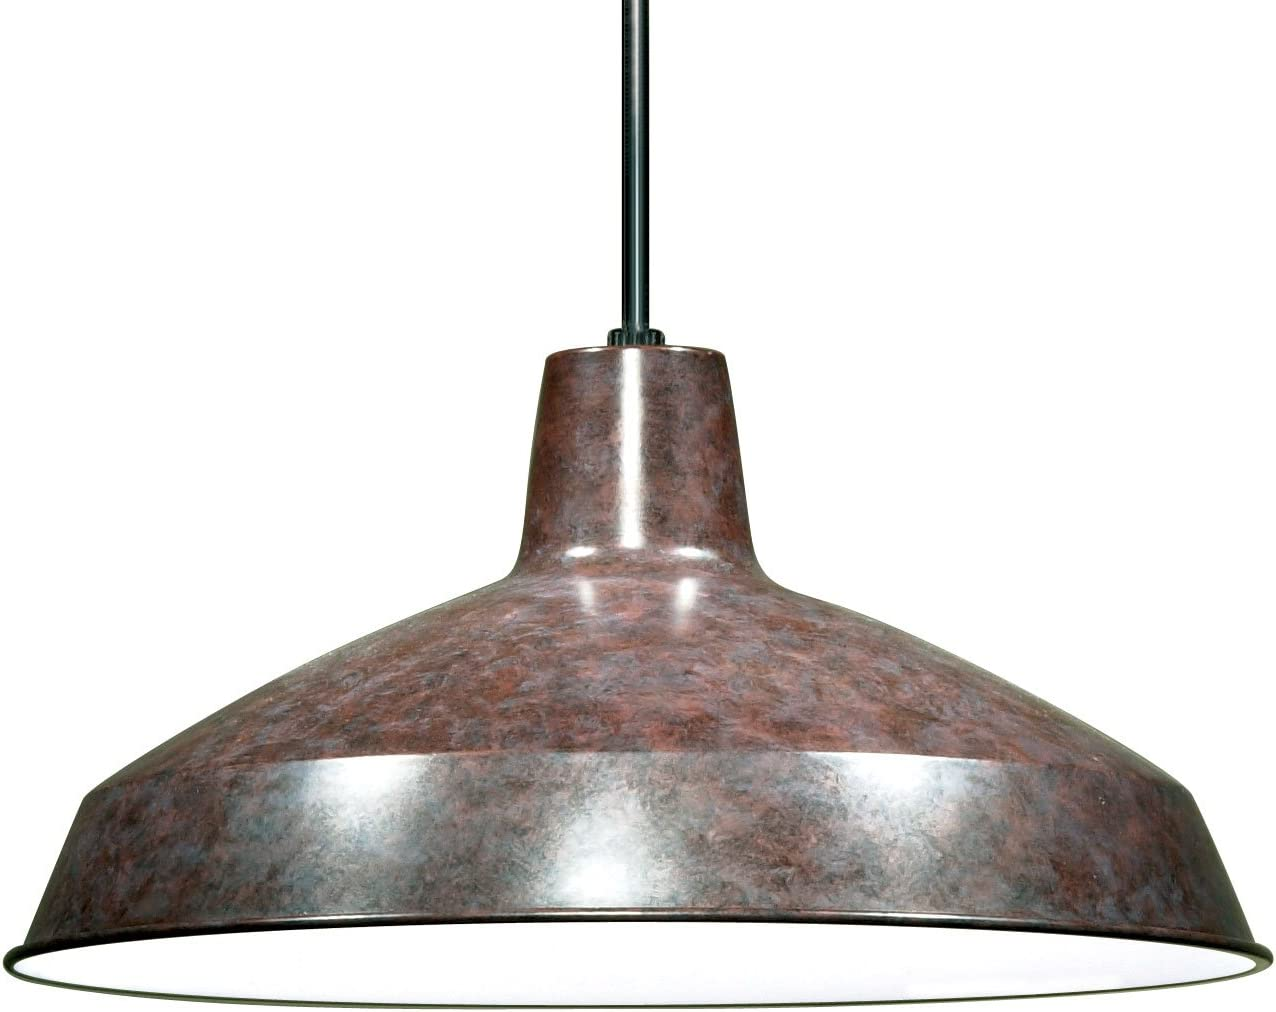 Nuvo Lighting SF76 662 Warehouse Shade, Old Bronze